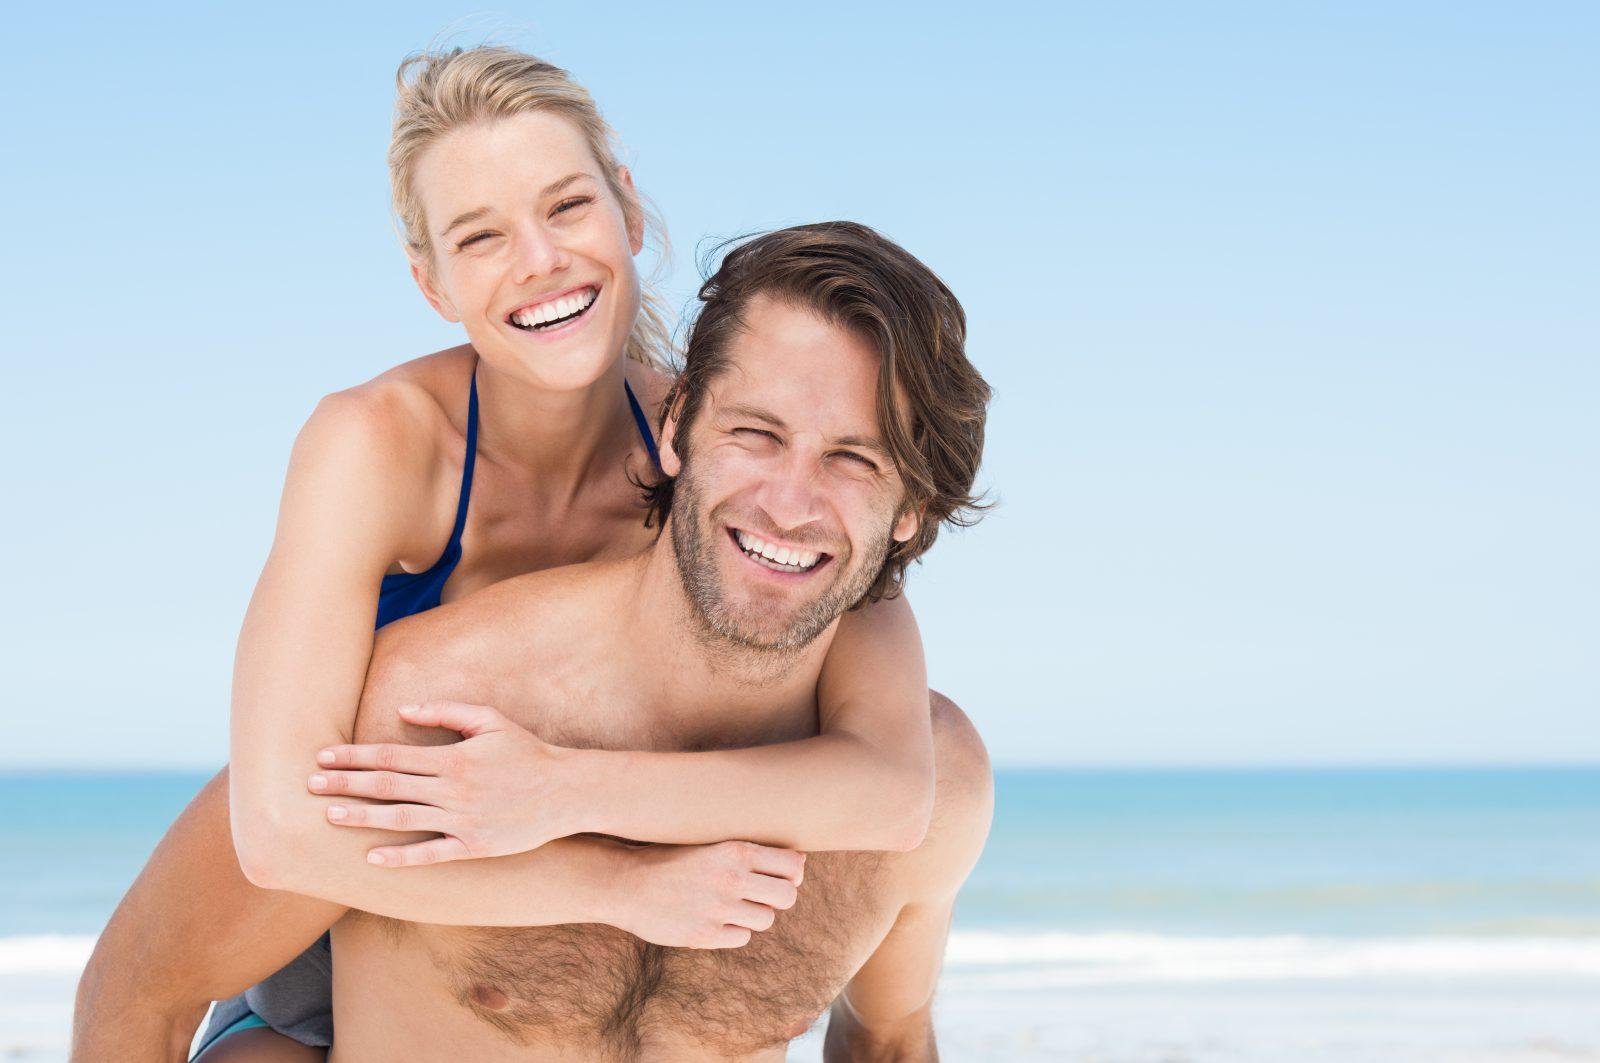 Diseñamos sonrisas - Estética dental - Prodental